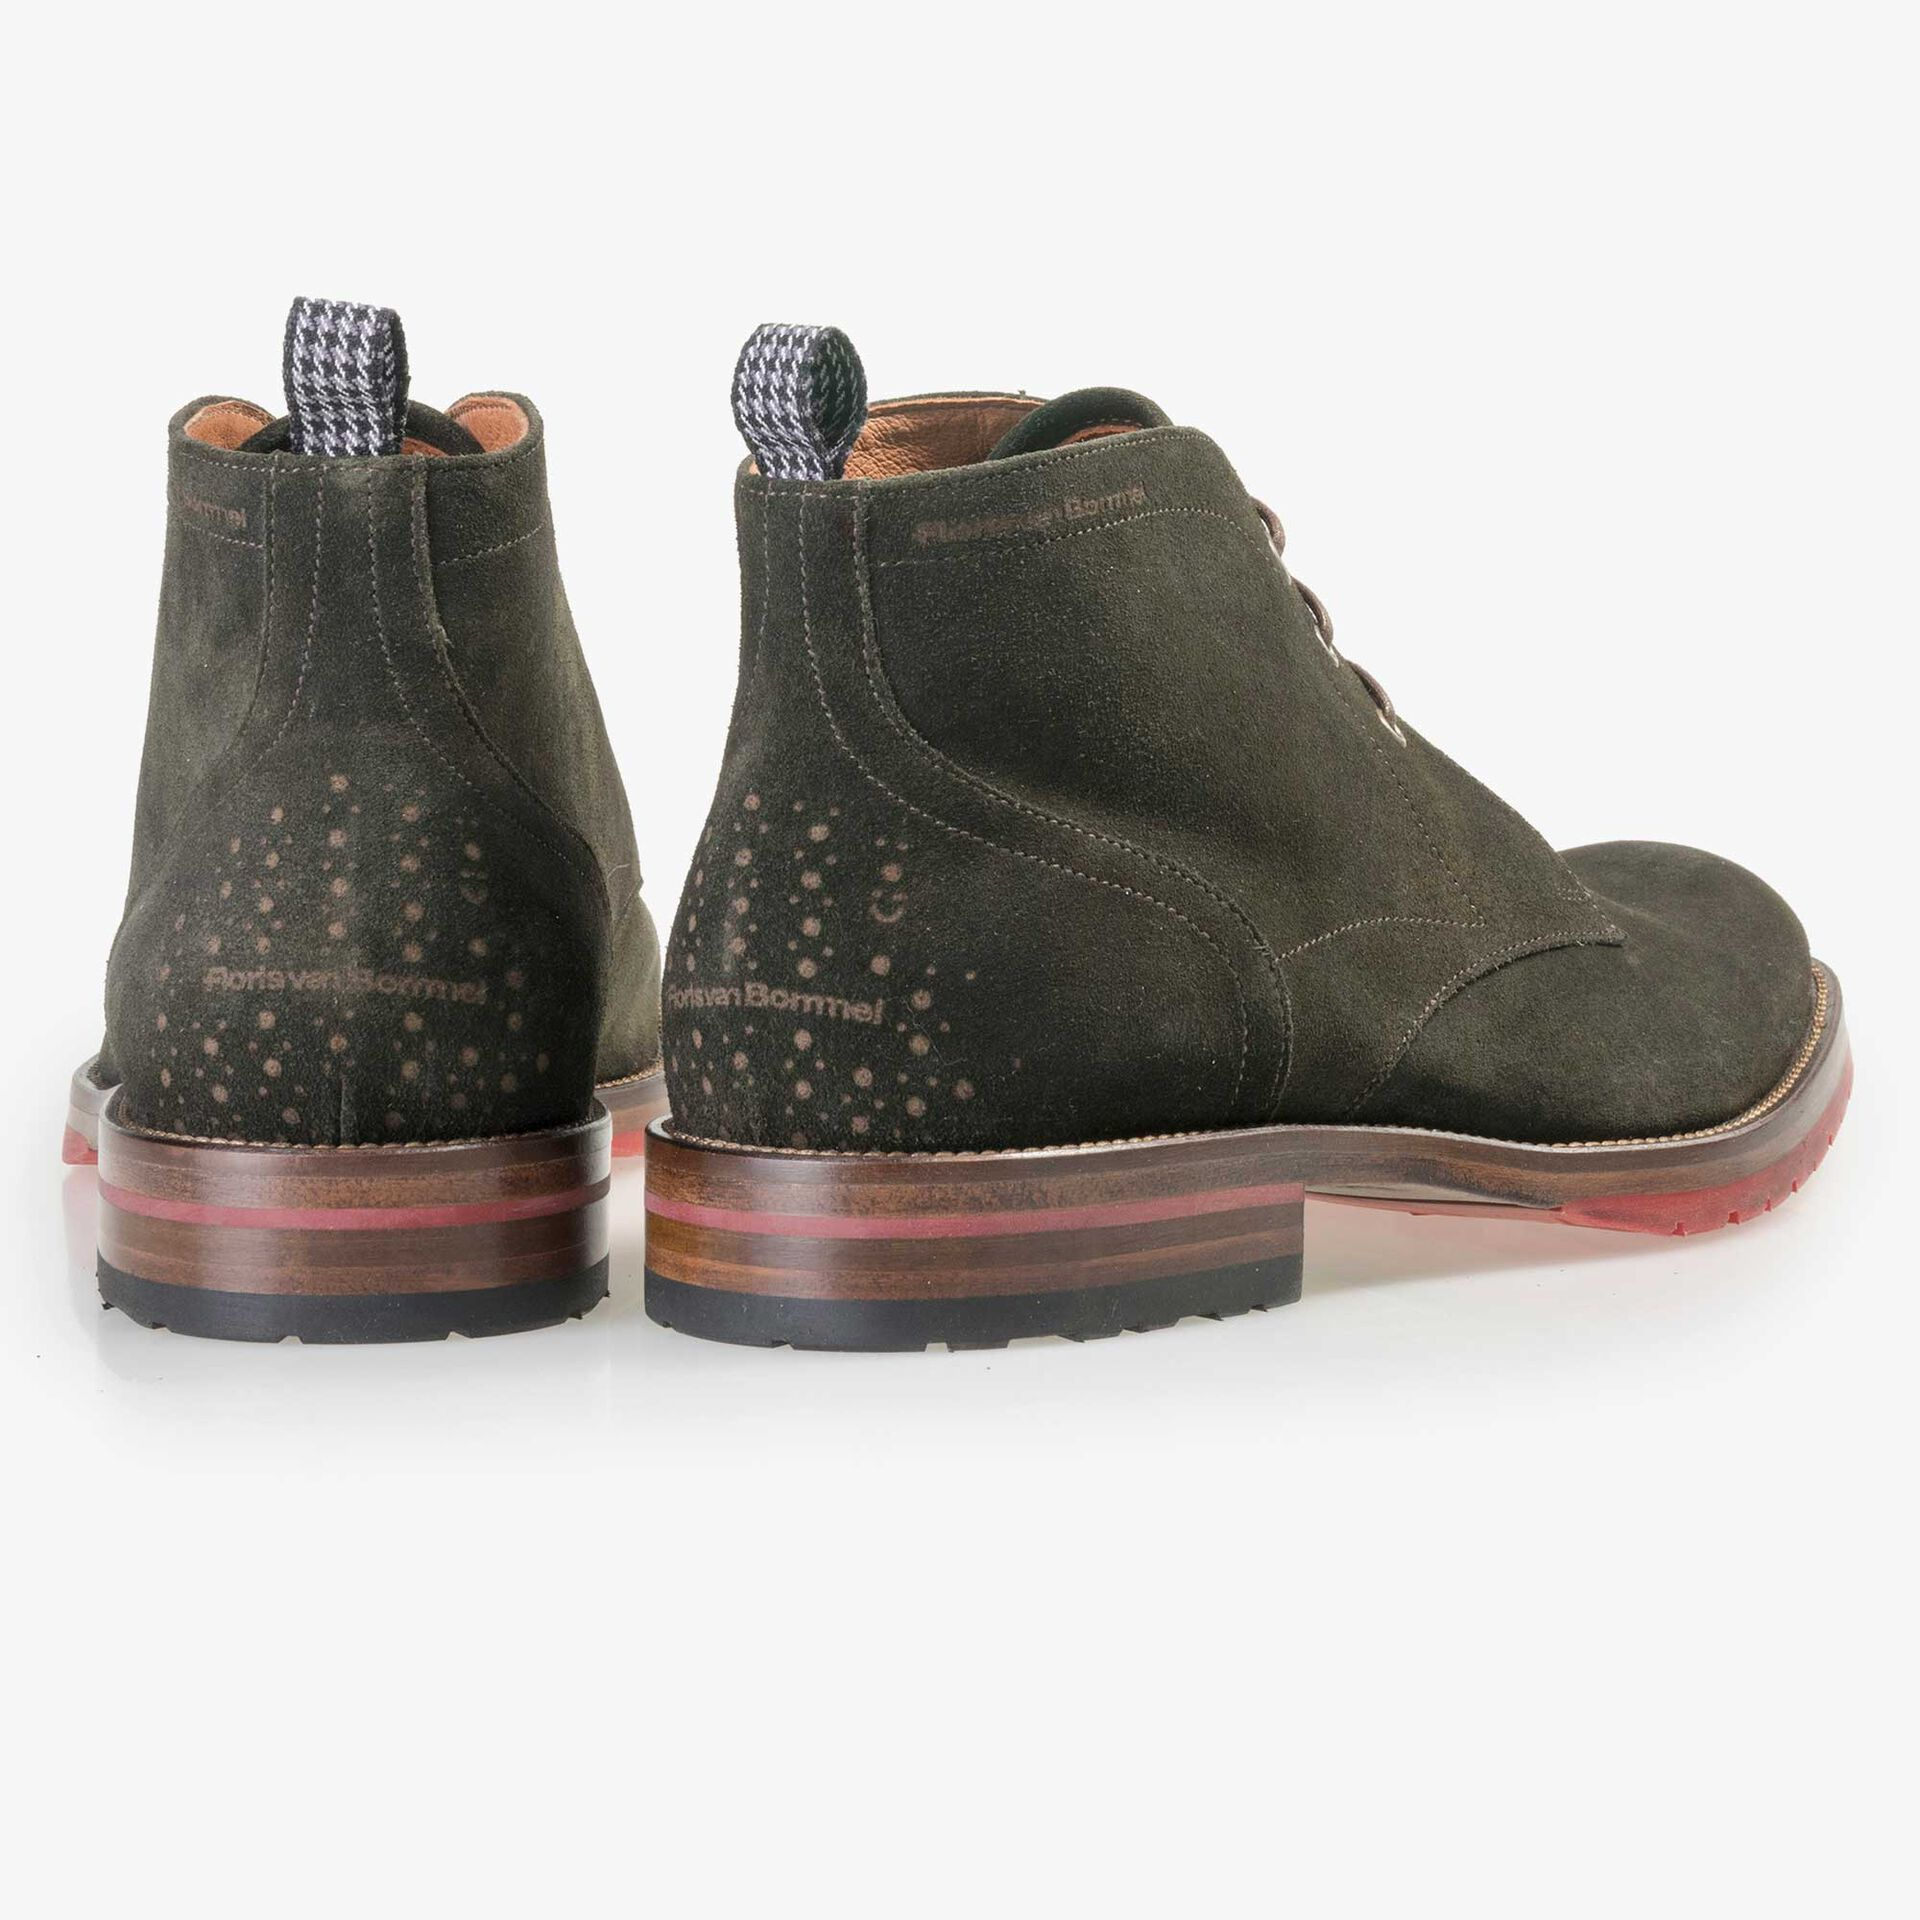 Floris van Bommel men's olive green suede leather lace boot